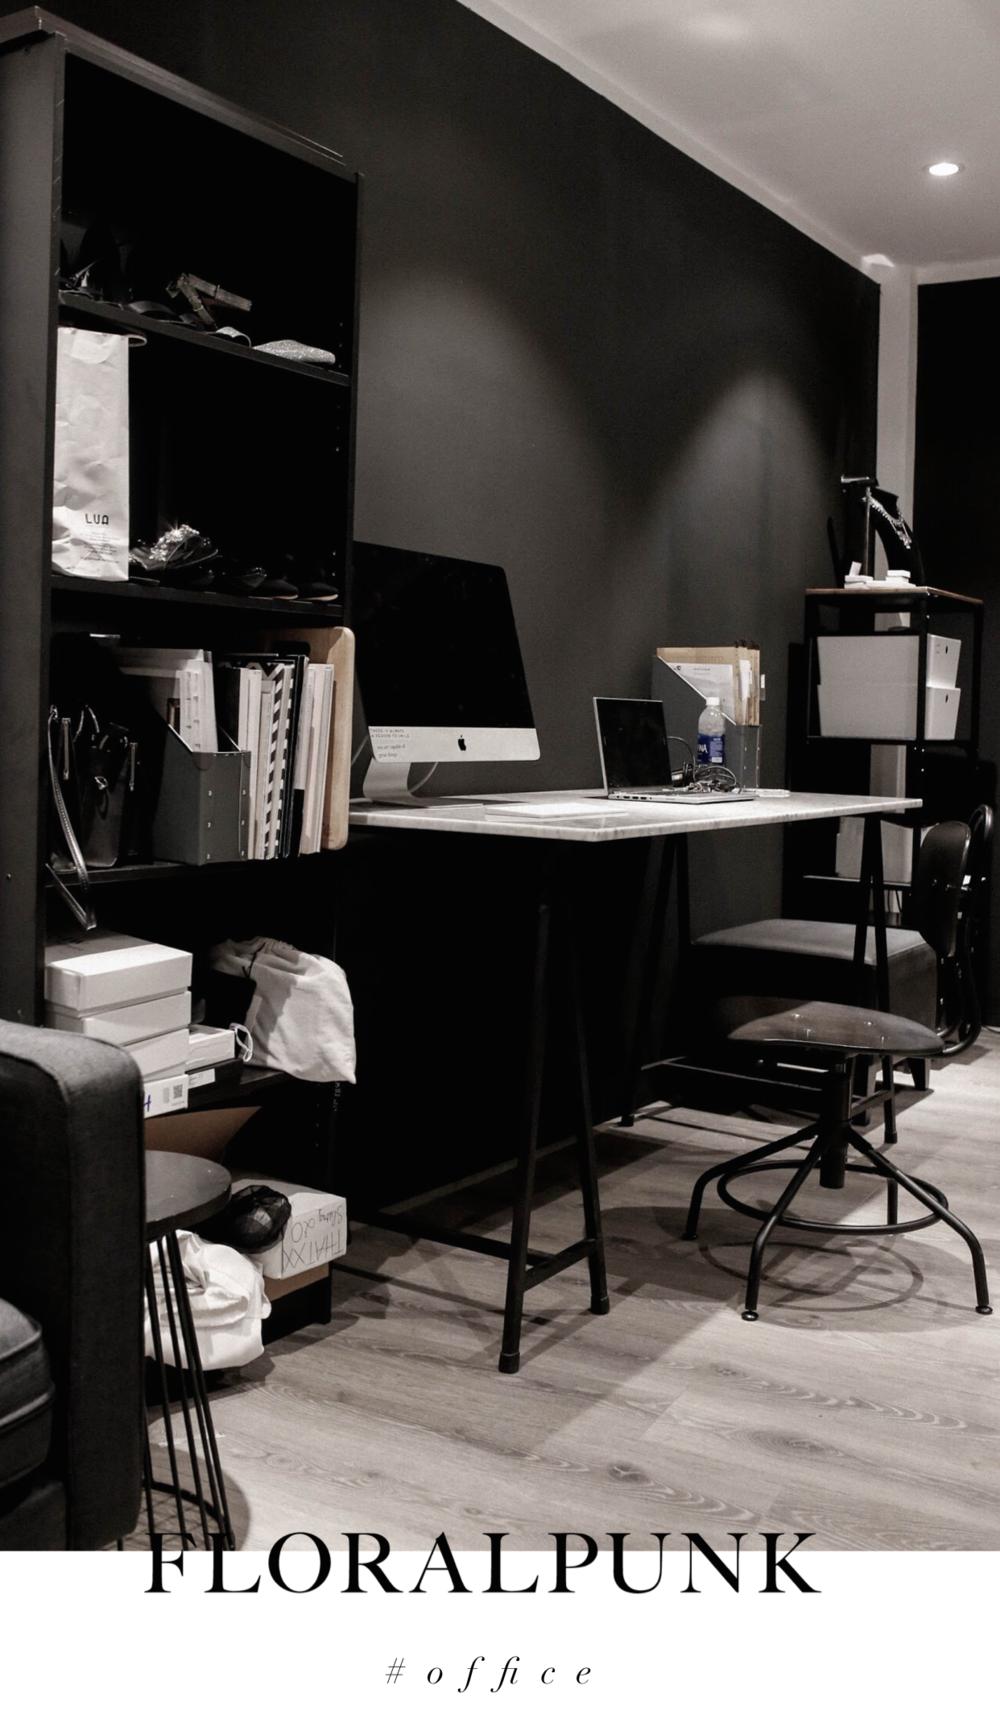 Floralpunk office van phong cool